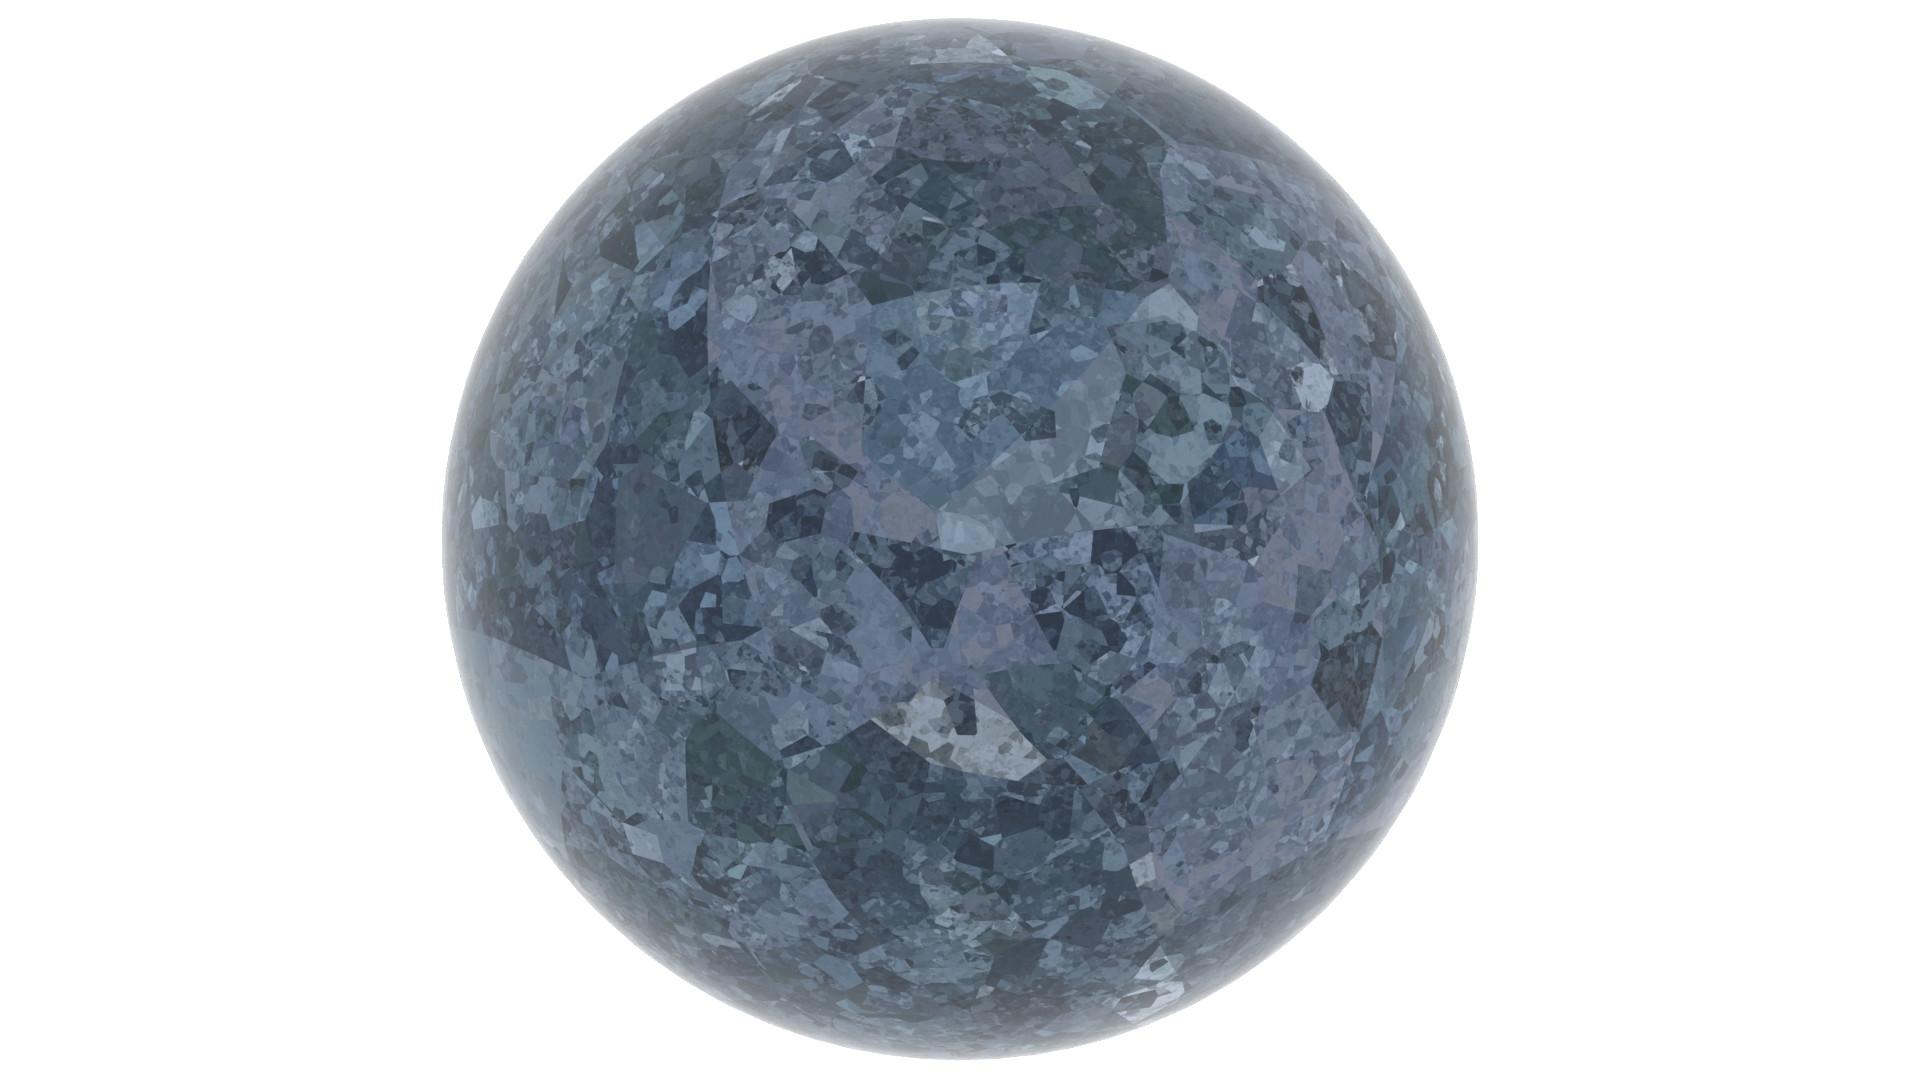 Parabhdeep singh cell noise shader stone 01